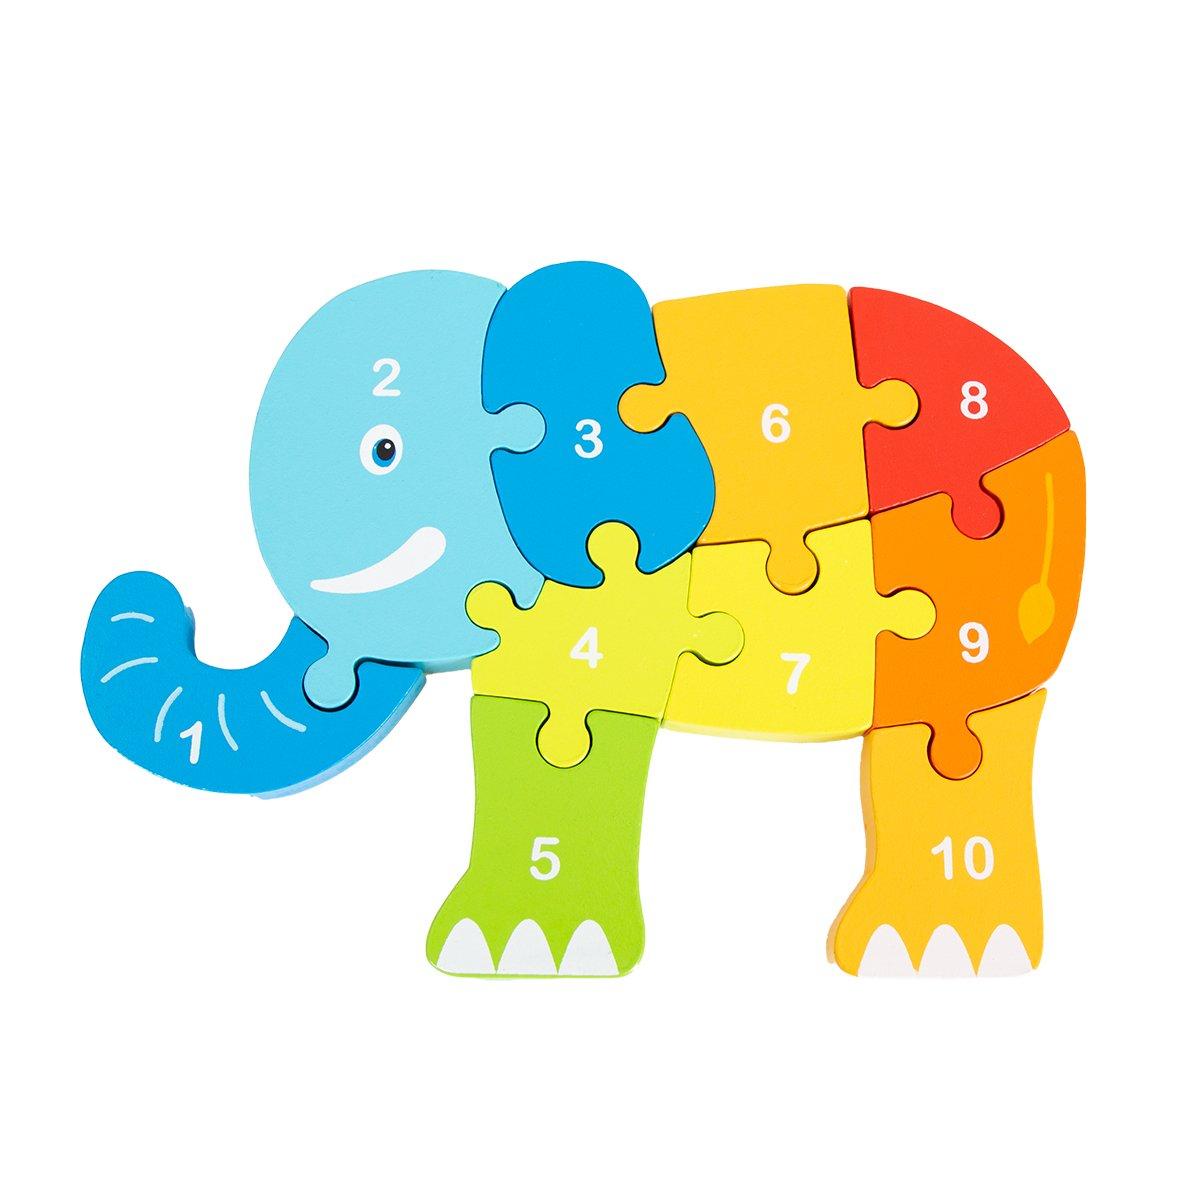 Jucarie bebelusi Noriel Bebe Wood - Puzzle elefant imagine 2021